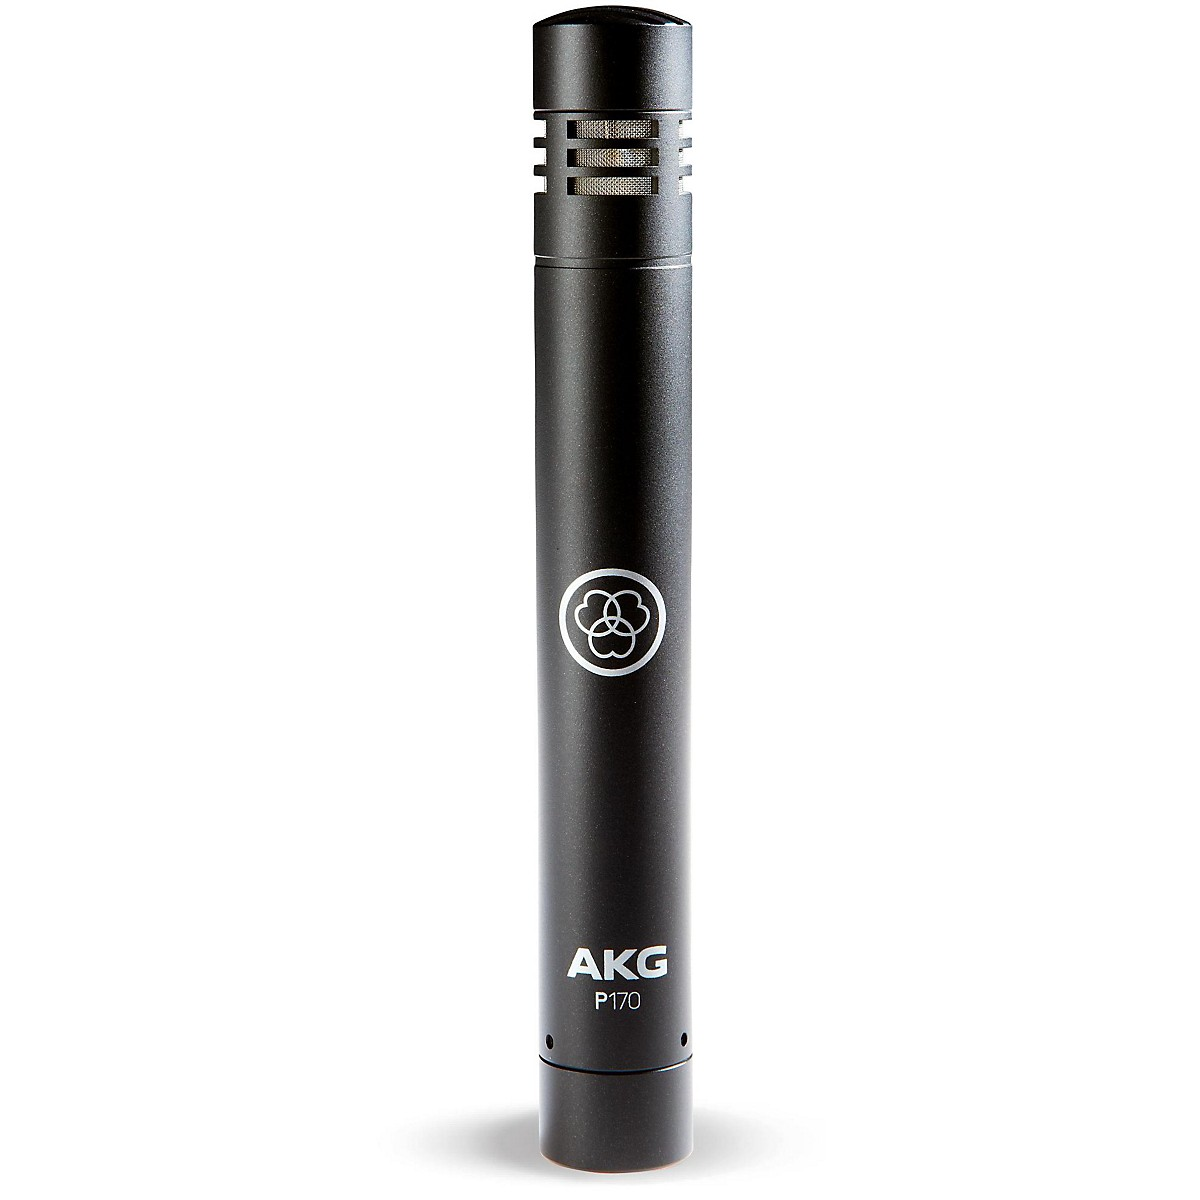 2 AKG P170 Studio Condenser Pencil Microphones Instrument Drum Mics+Headphones